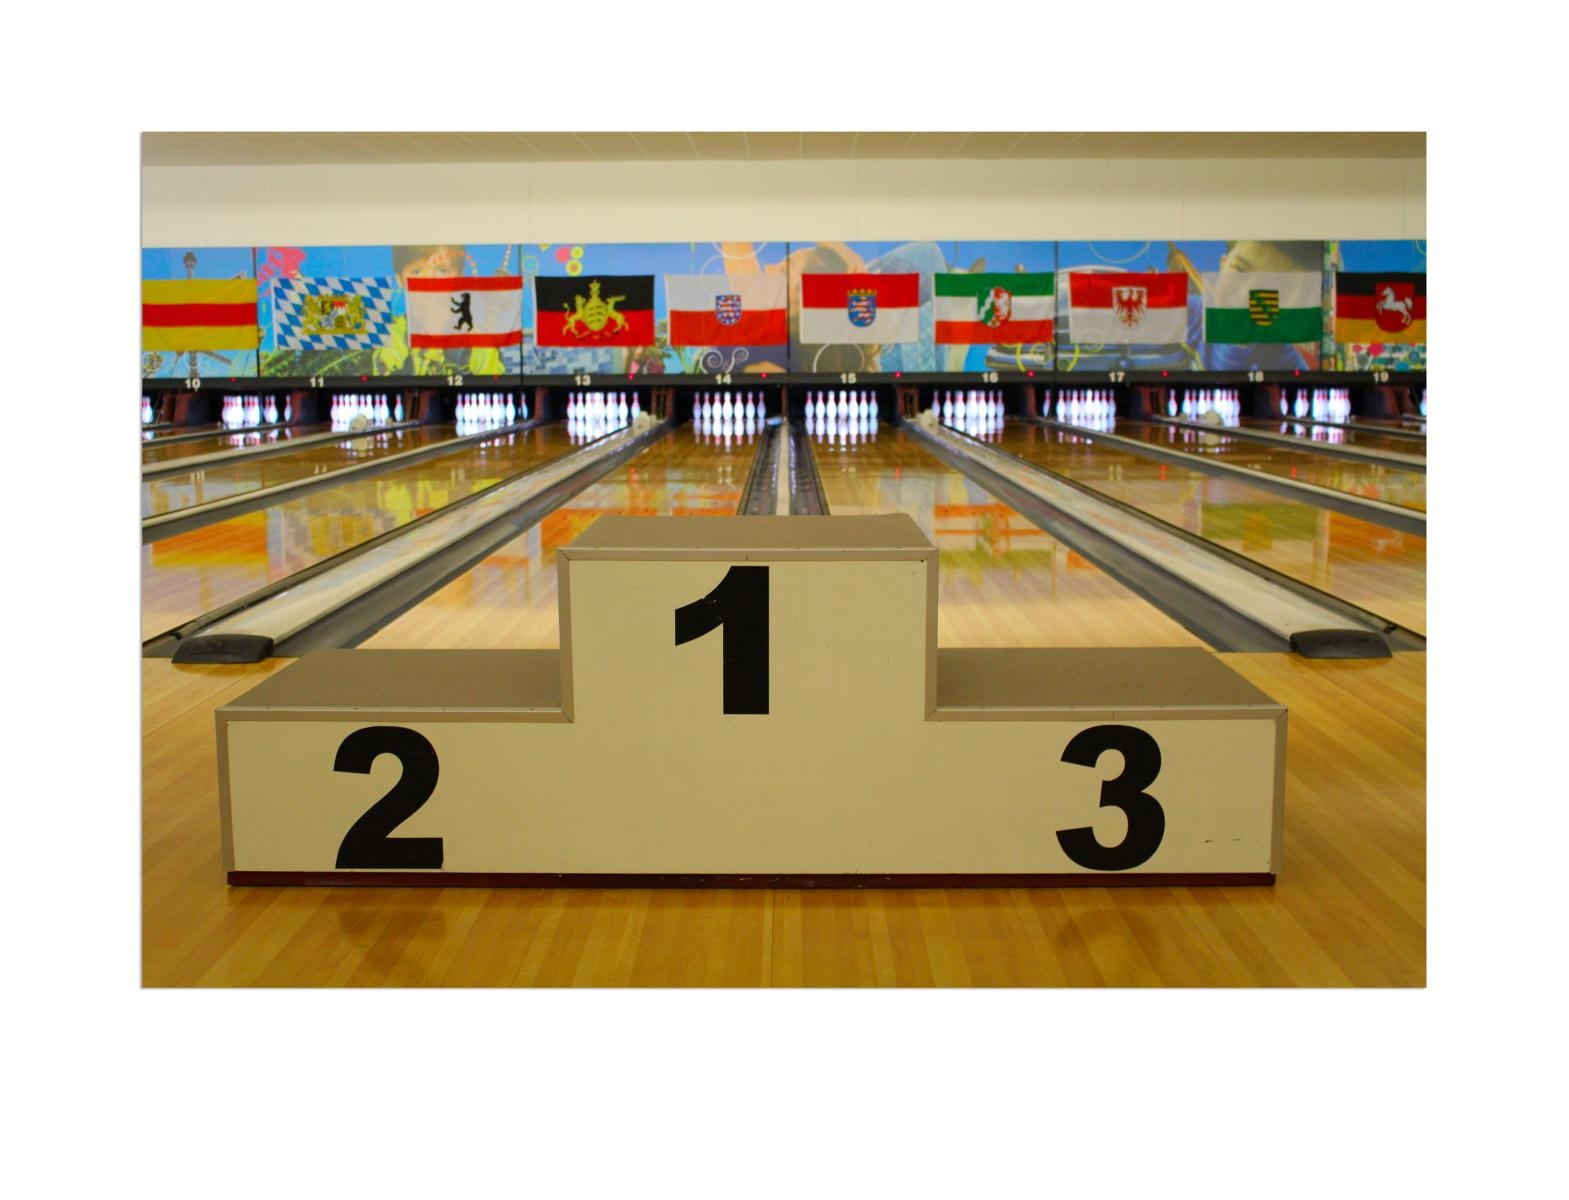 leinwandbild bowling siegerehrung 80 x 120 cm. Black Bedroom Furniture Sets. Home Design Ideas